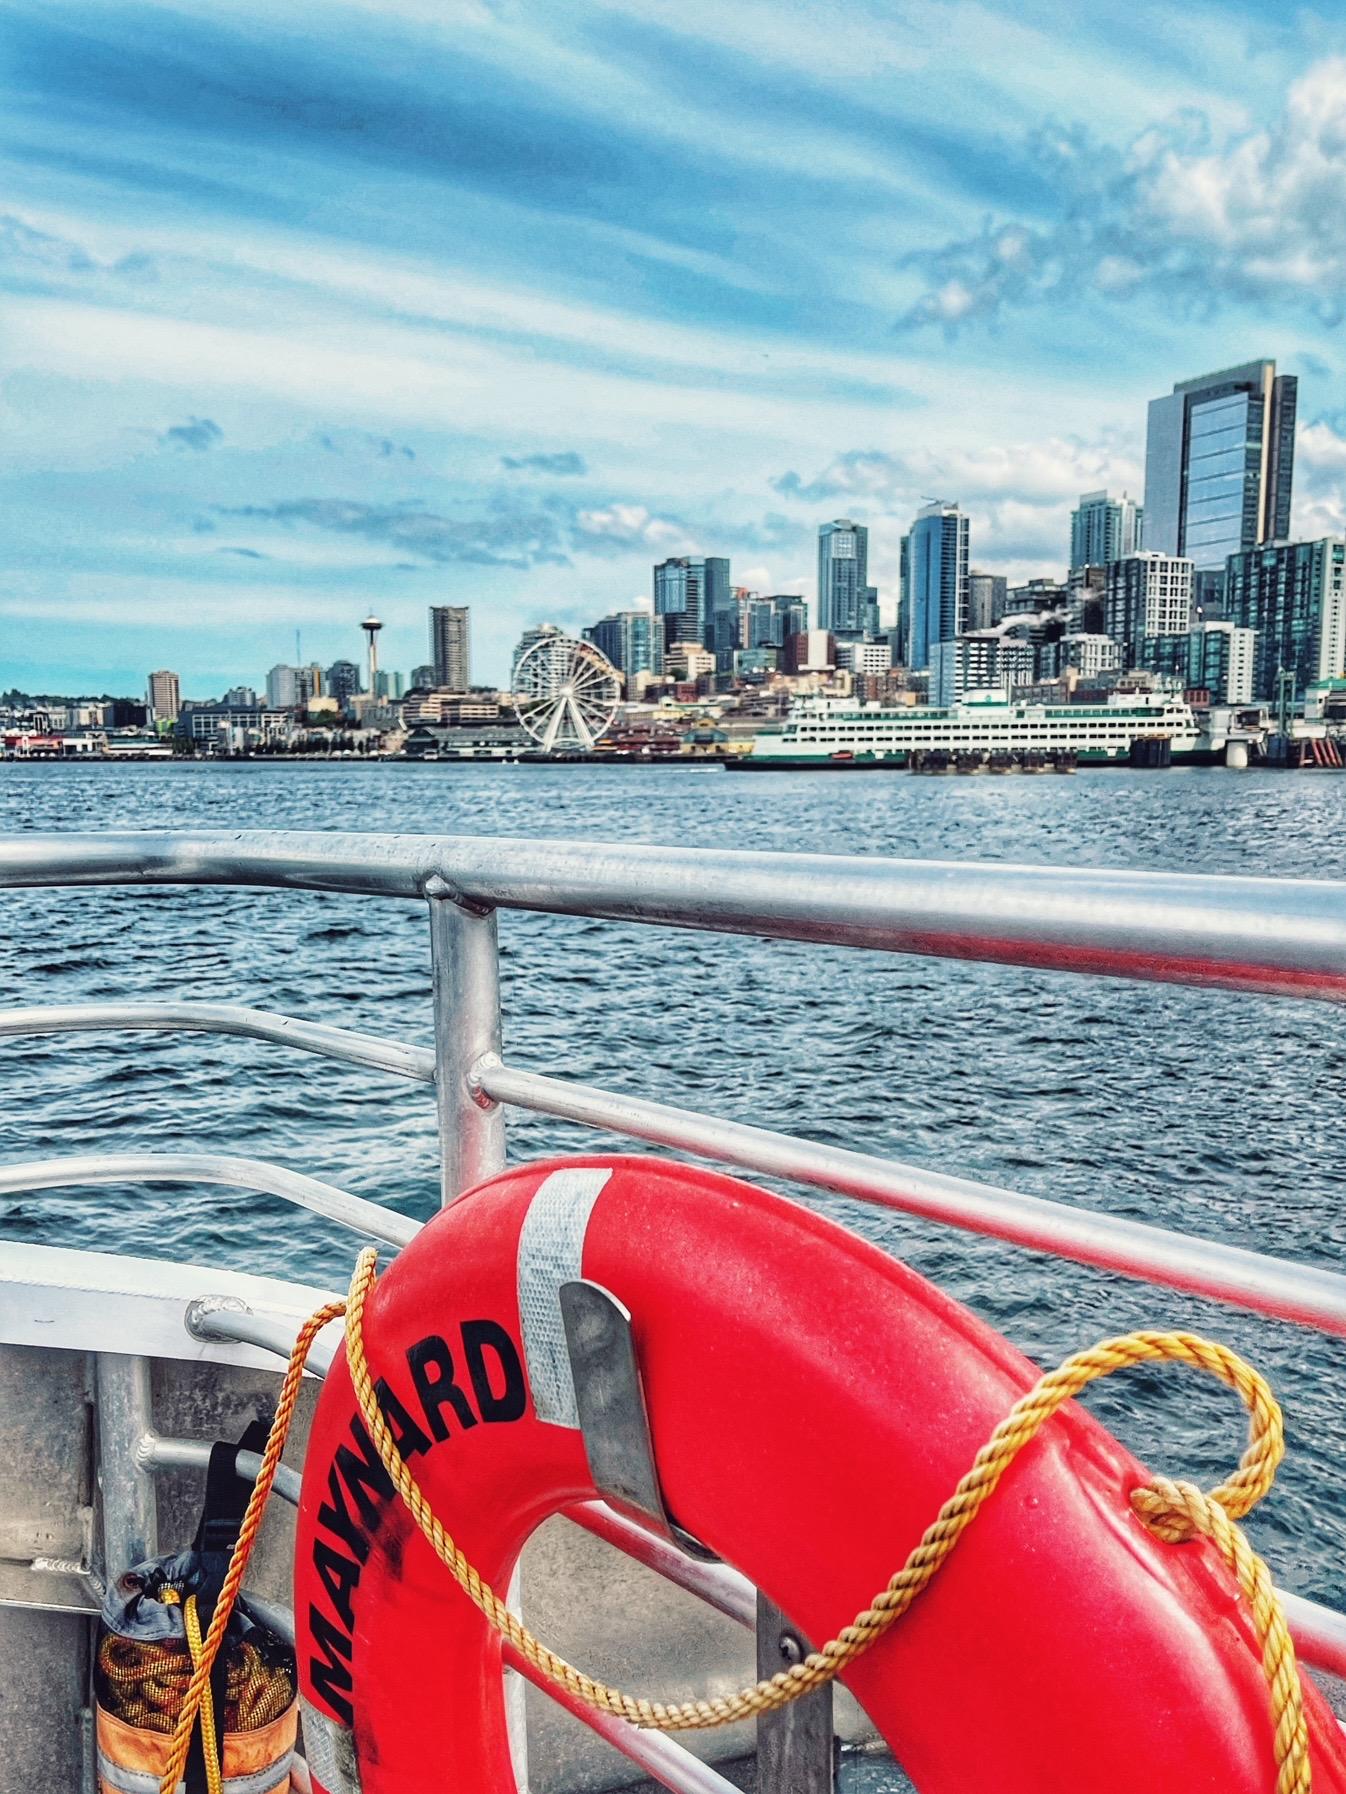 Alki ferry seattle day trip